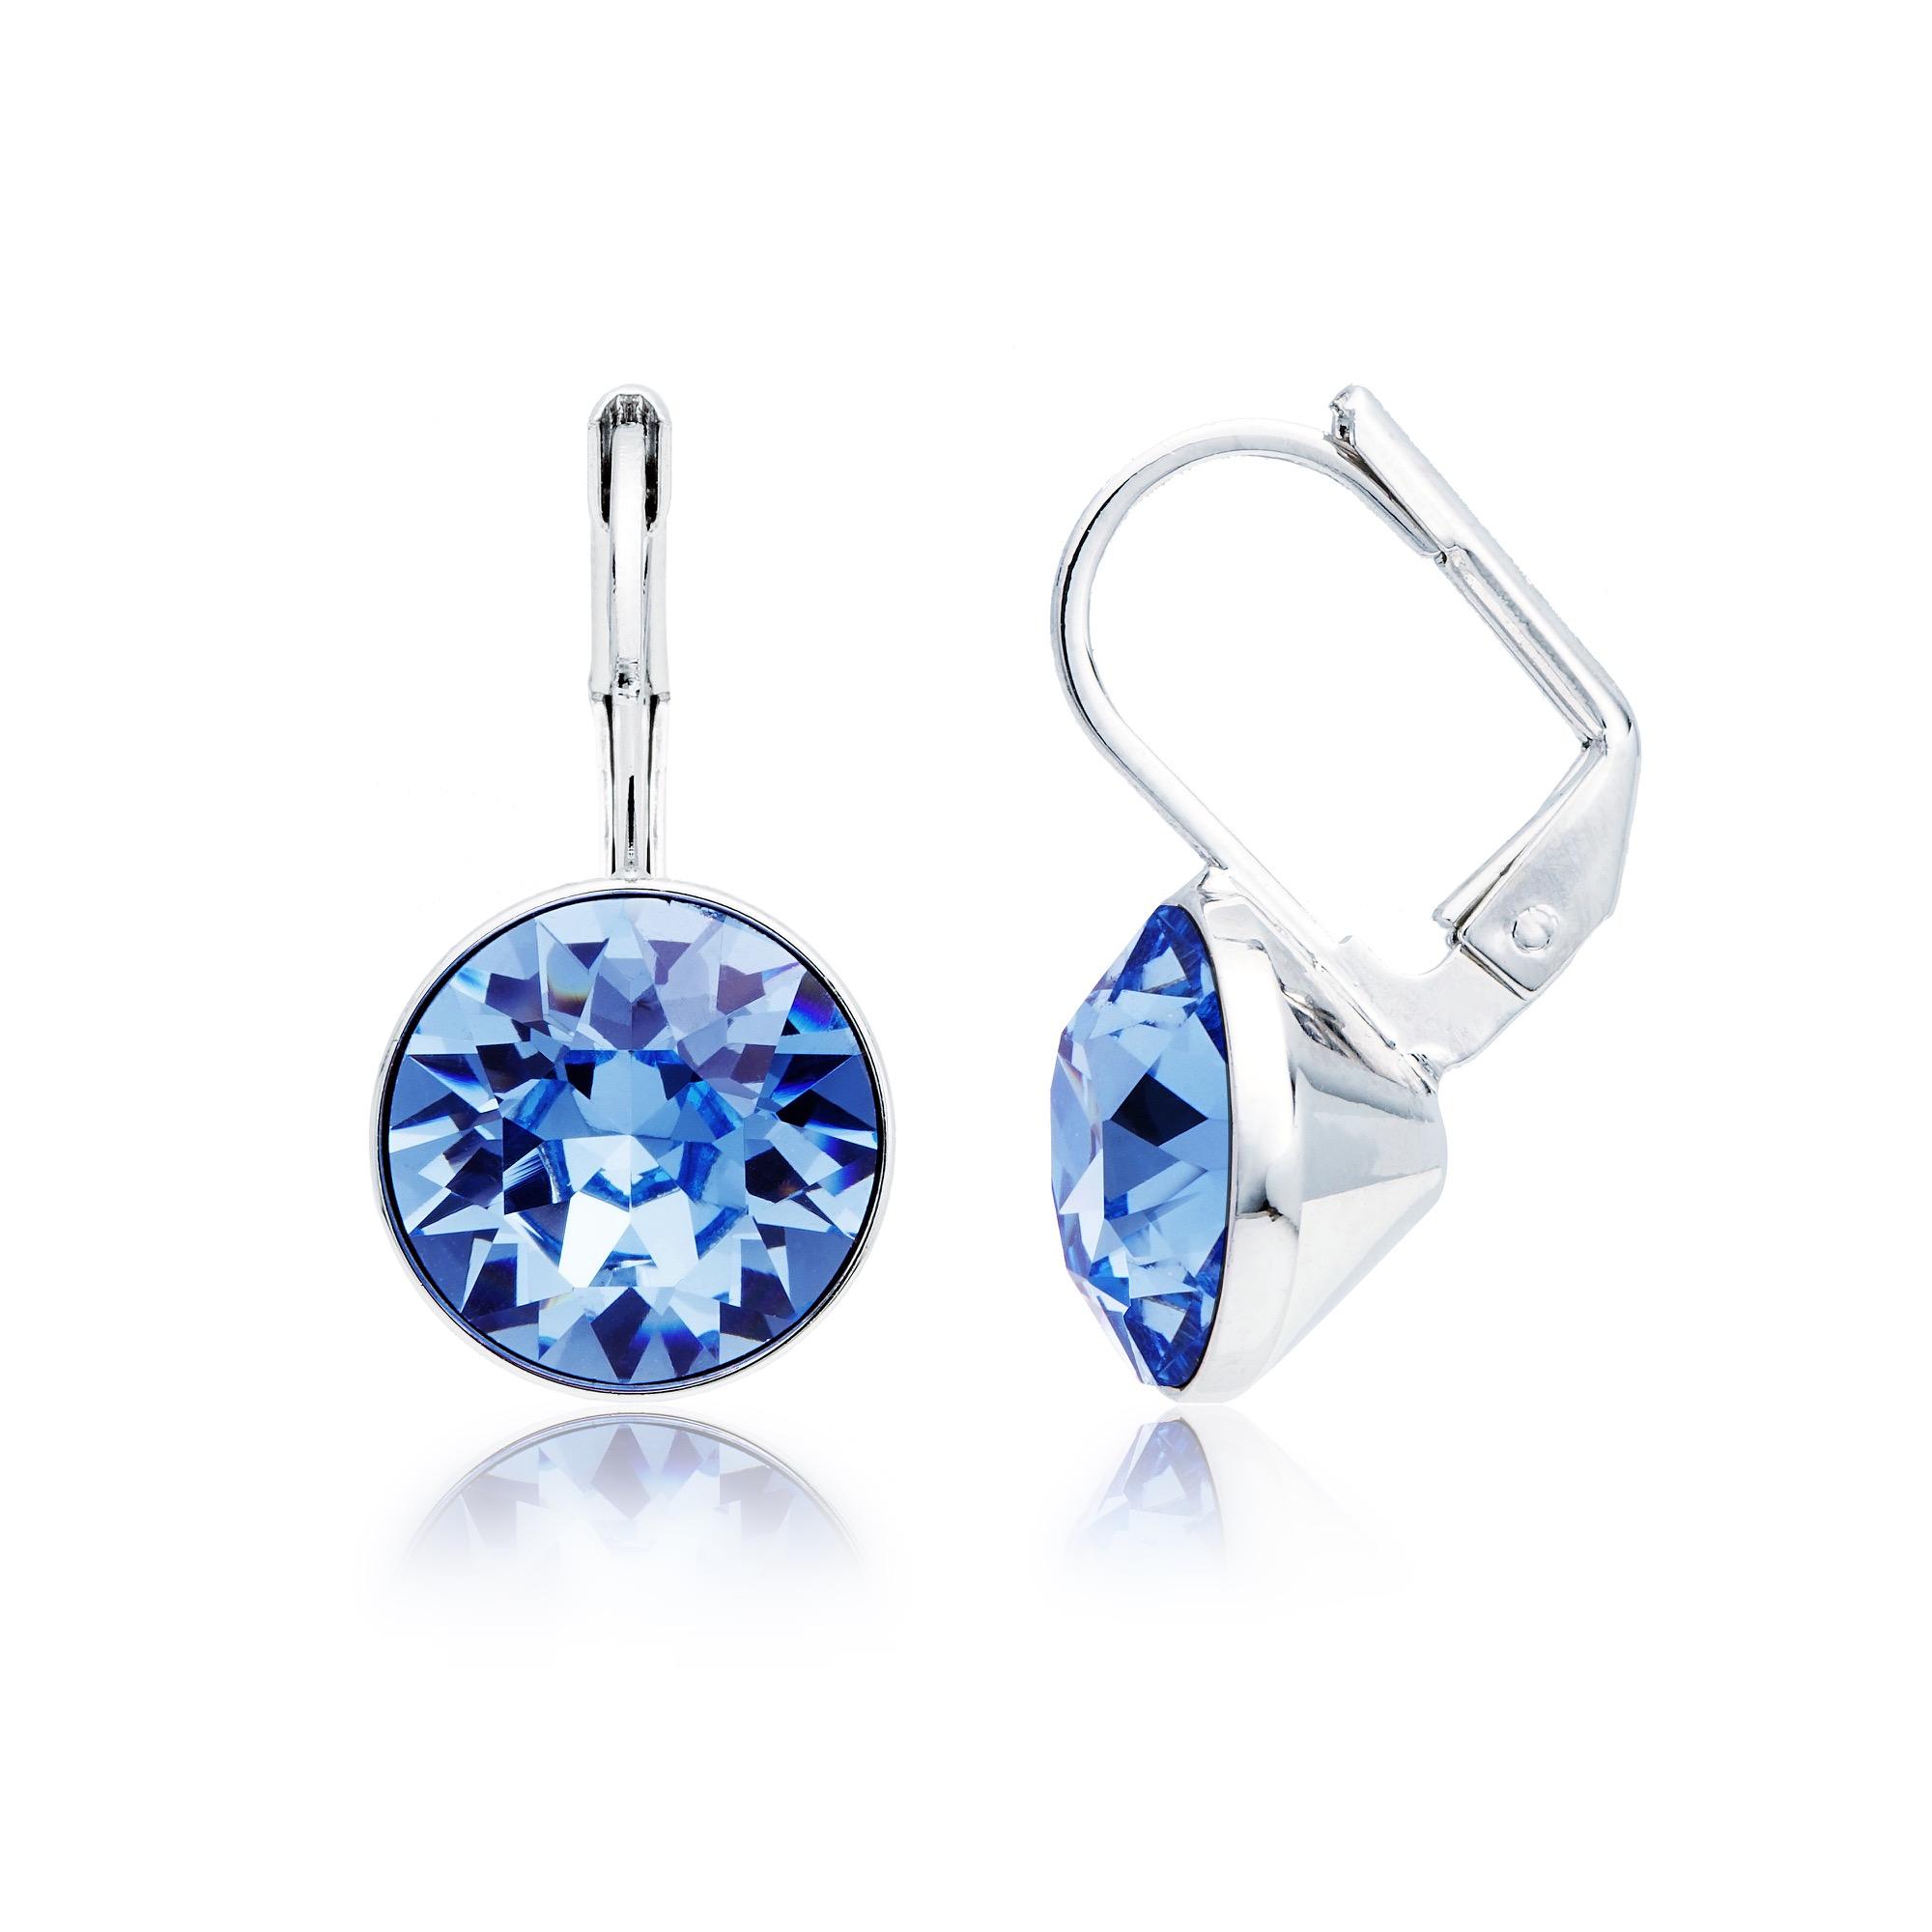 d3c8f6c436c392 Bella Earrings with 4 Carat Light Sapphire Swarovski® Crystals ...